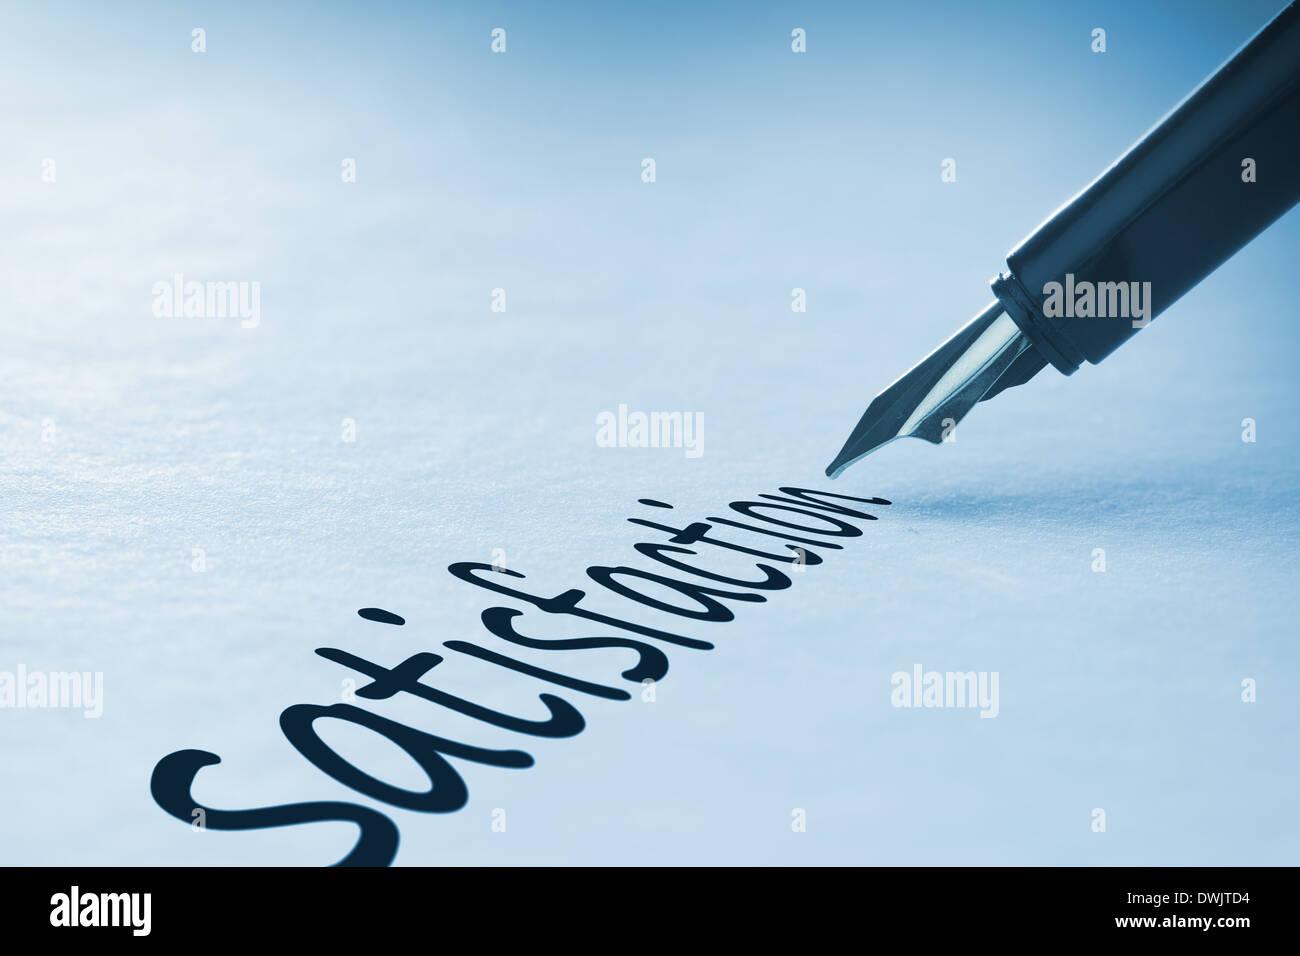 Fountain pen writing Satisfaction - Stock Image